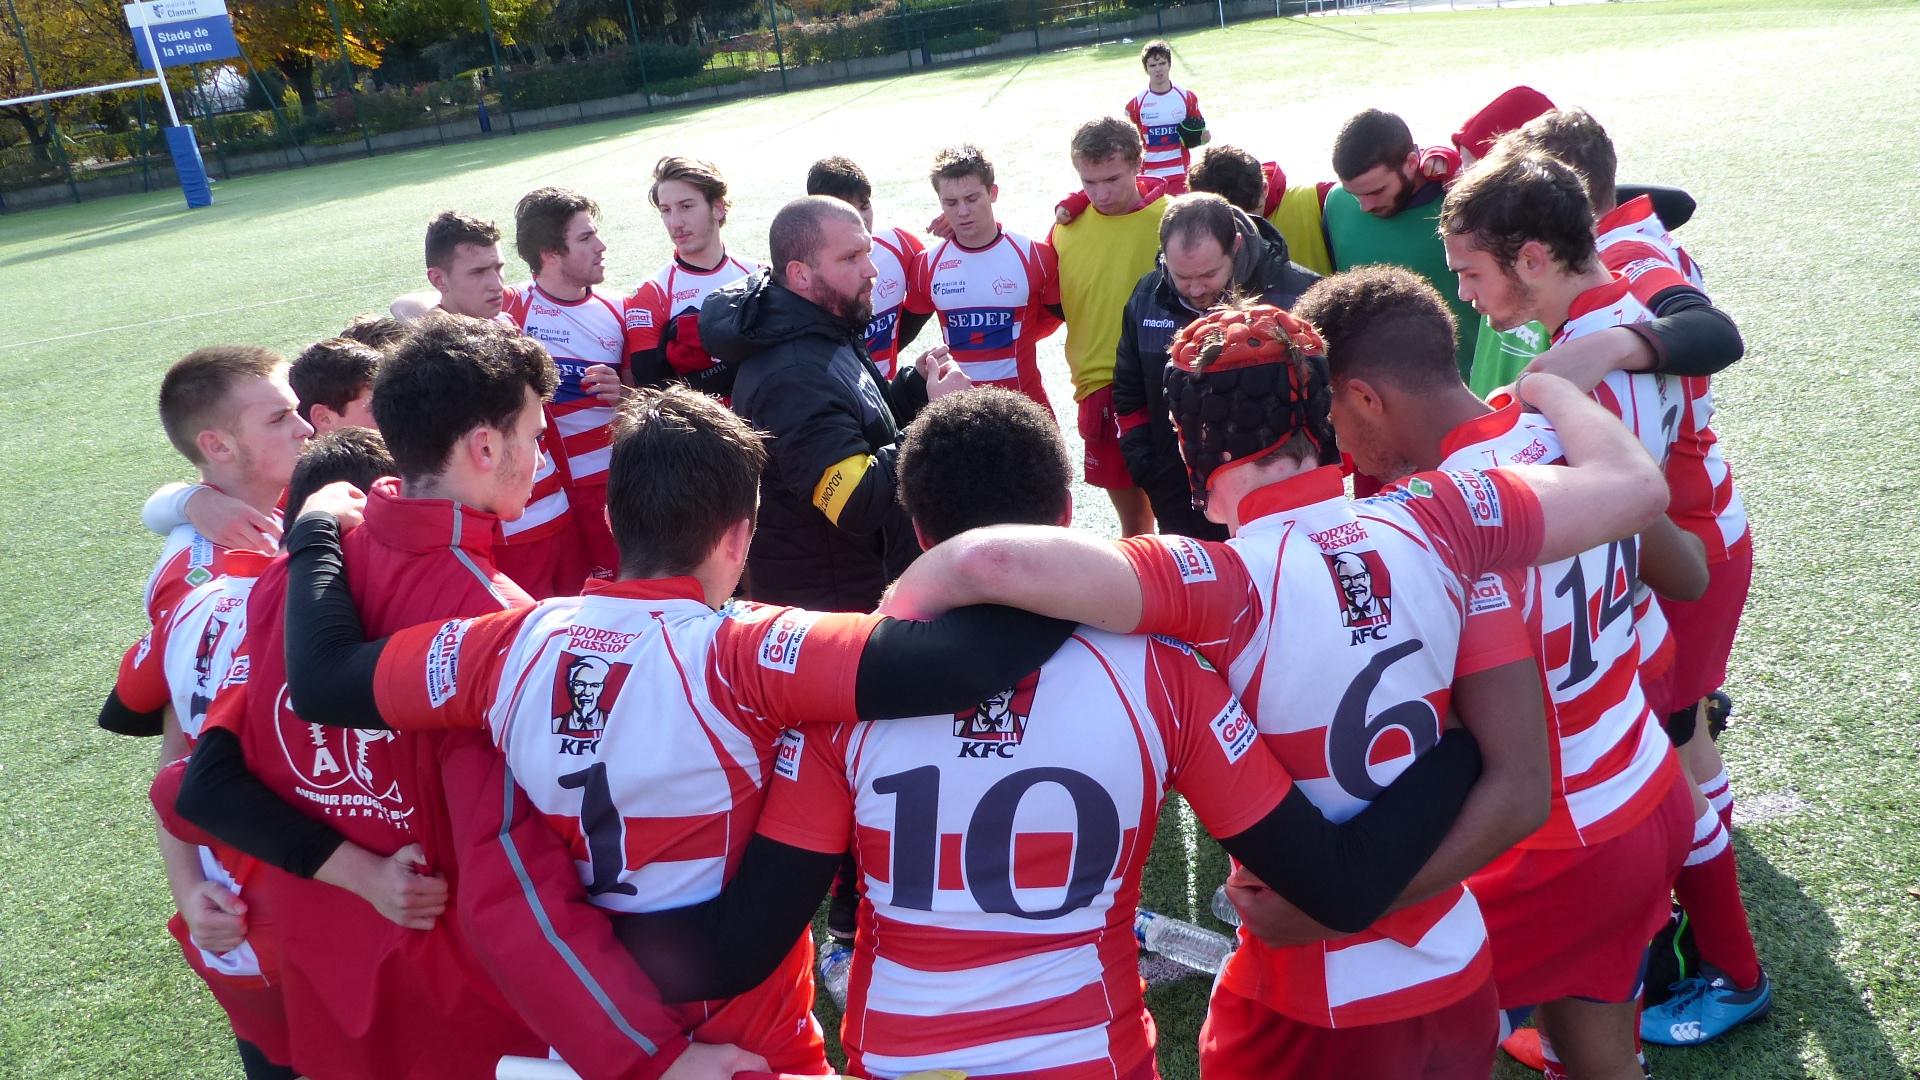 Clamart Rugby 92 -1er match de phase qualificative en Balandrade 12 novembre 2017